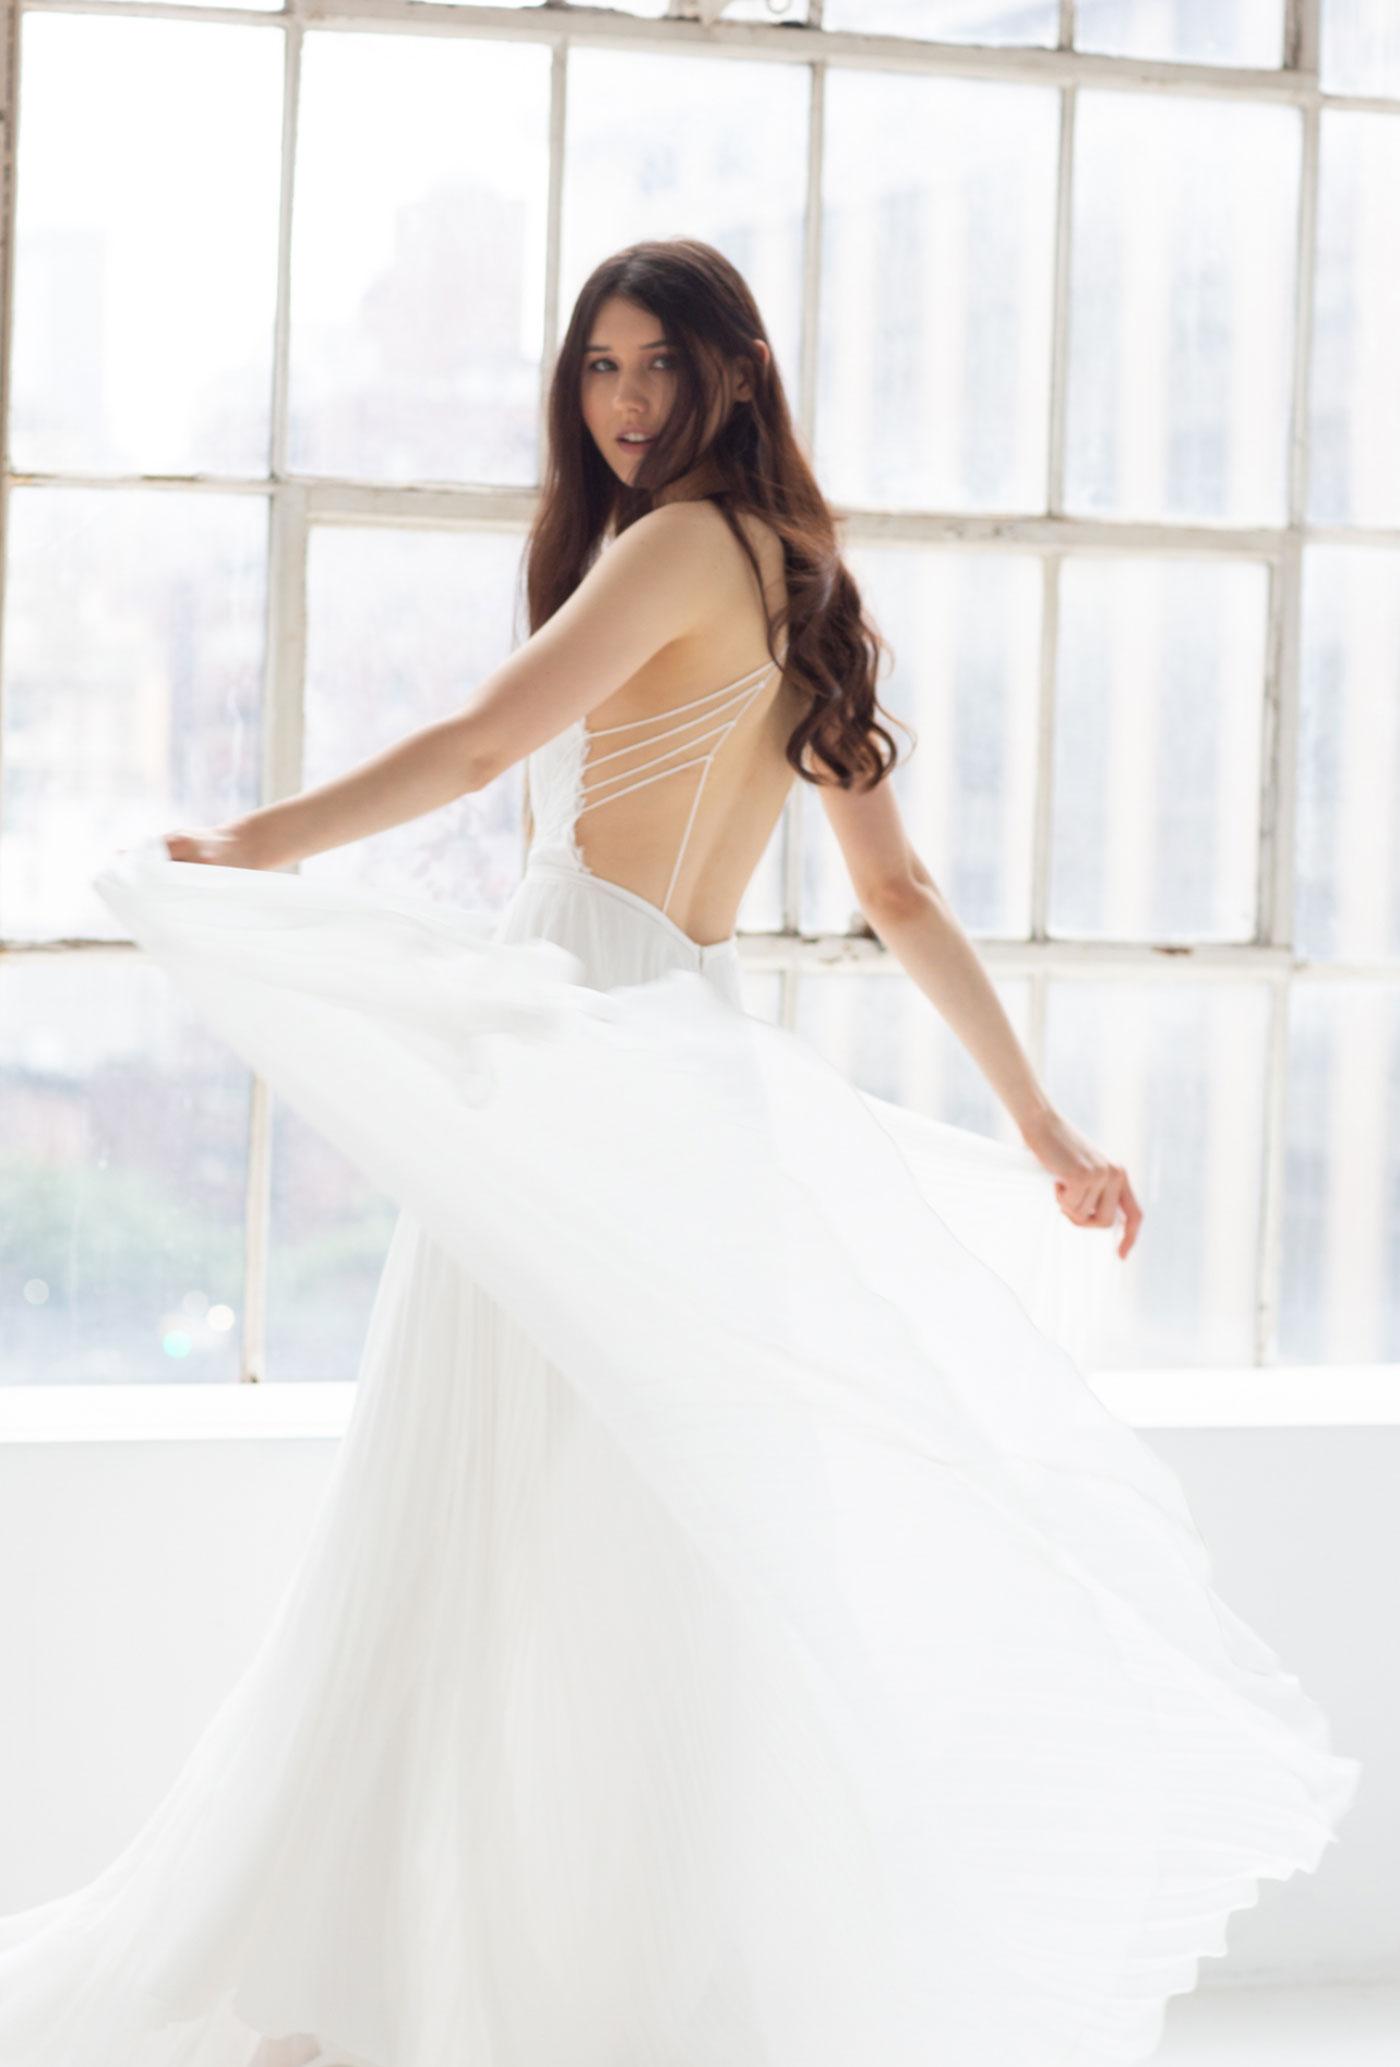 sheer, backless wedding dress